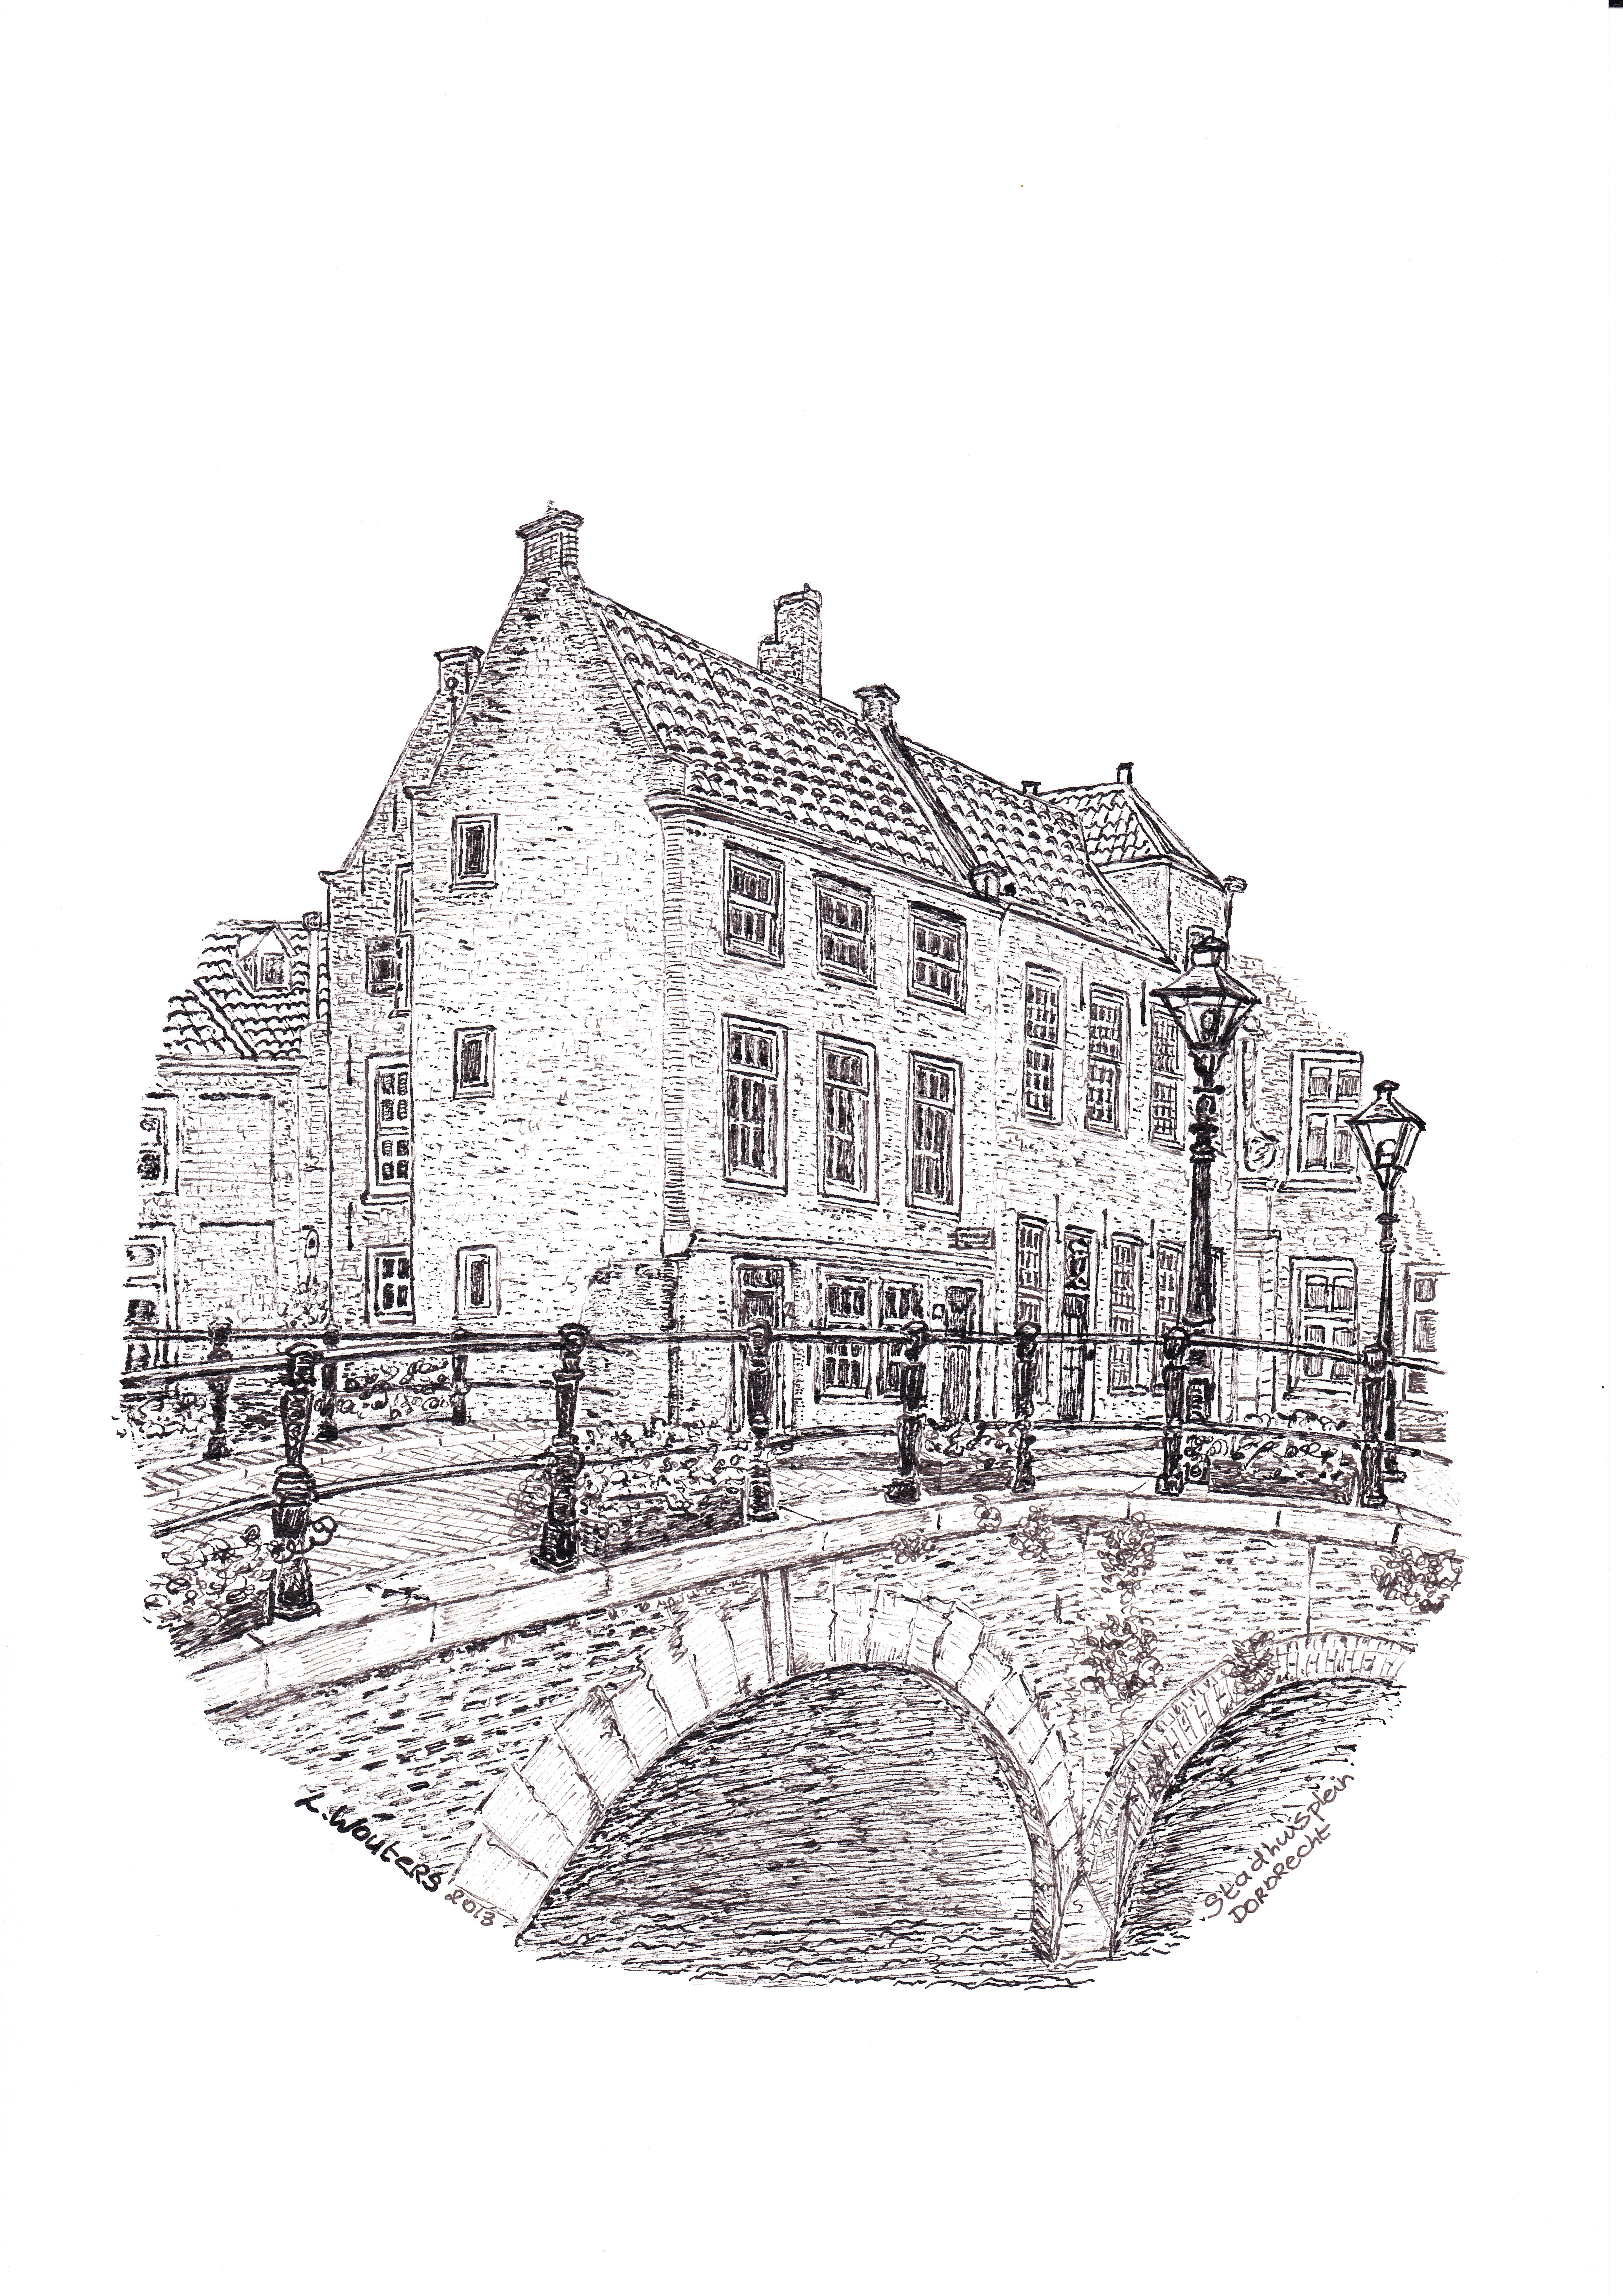 Pentekeningen Dordrecht